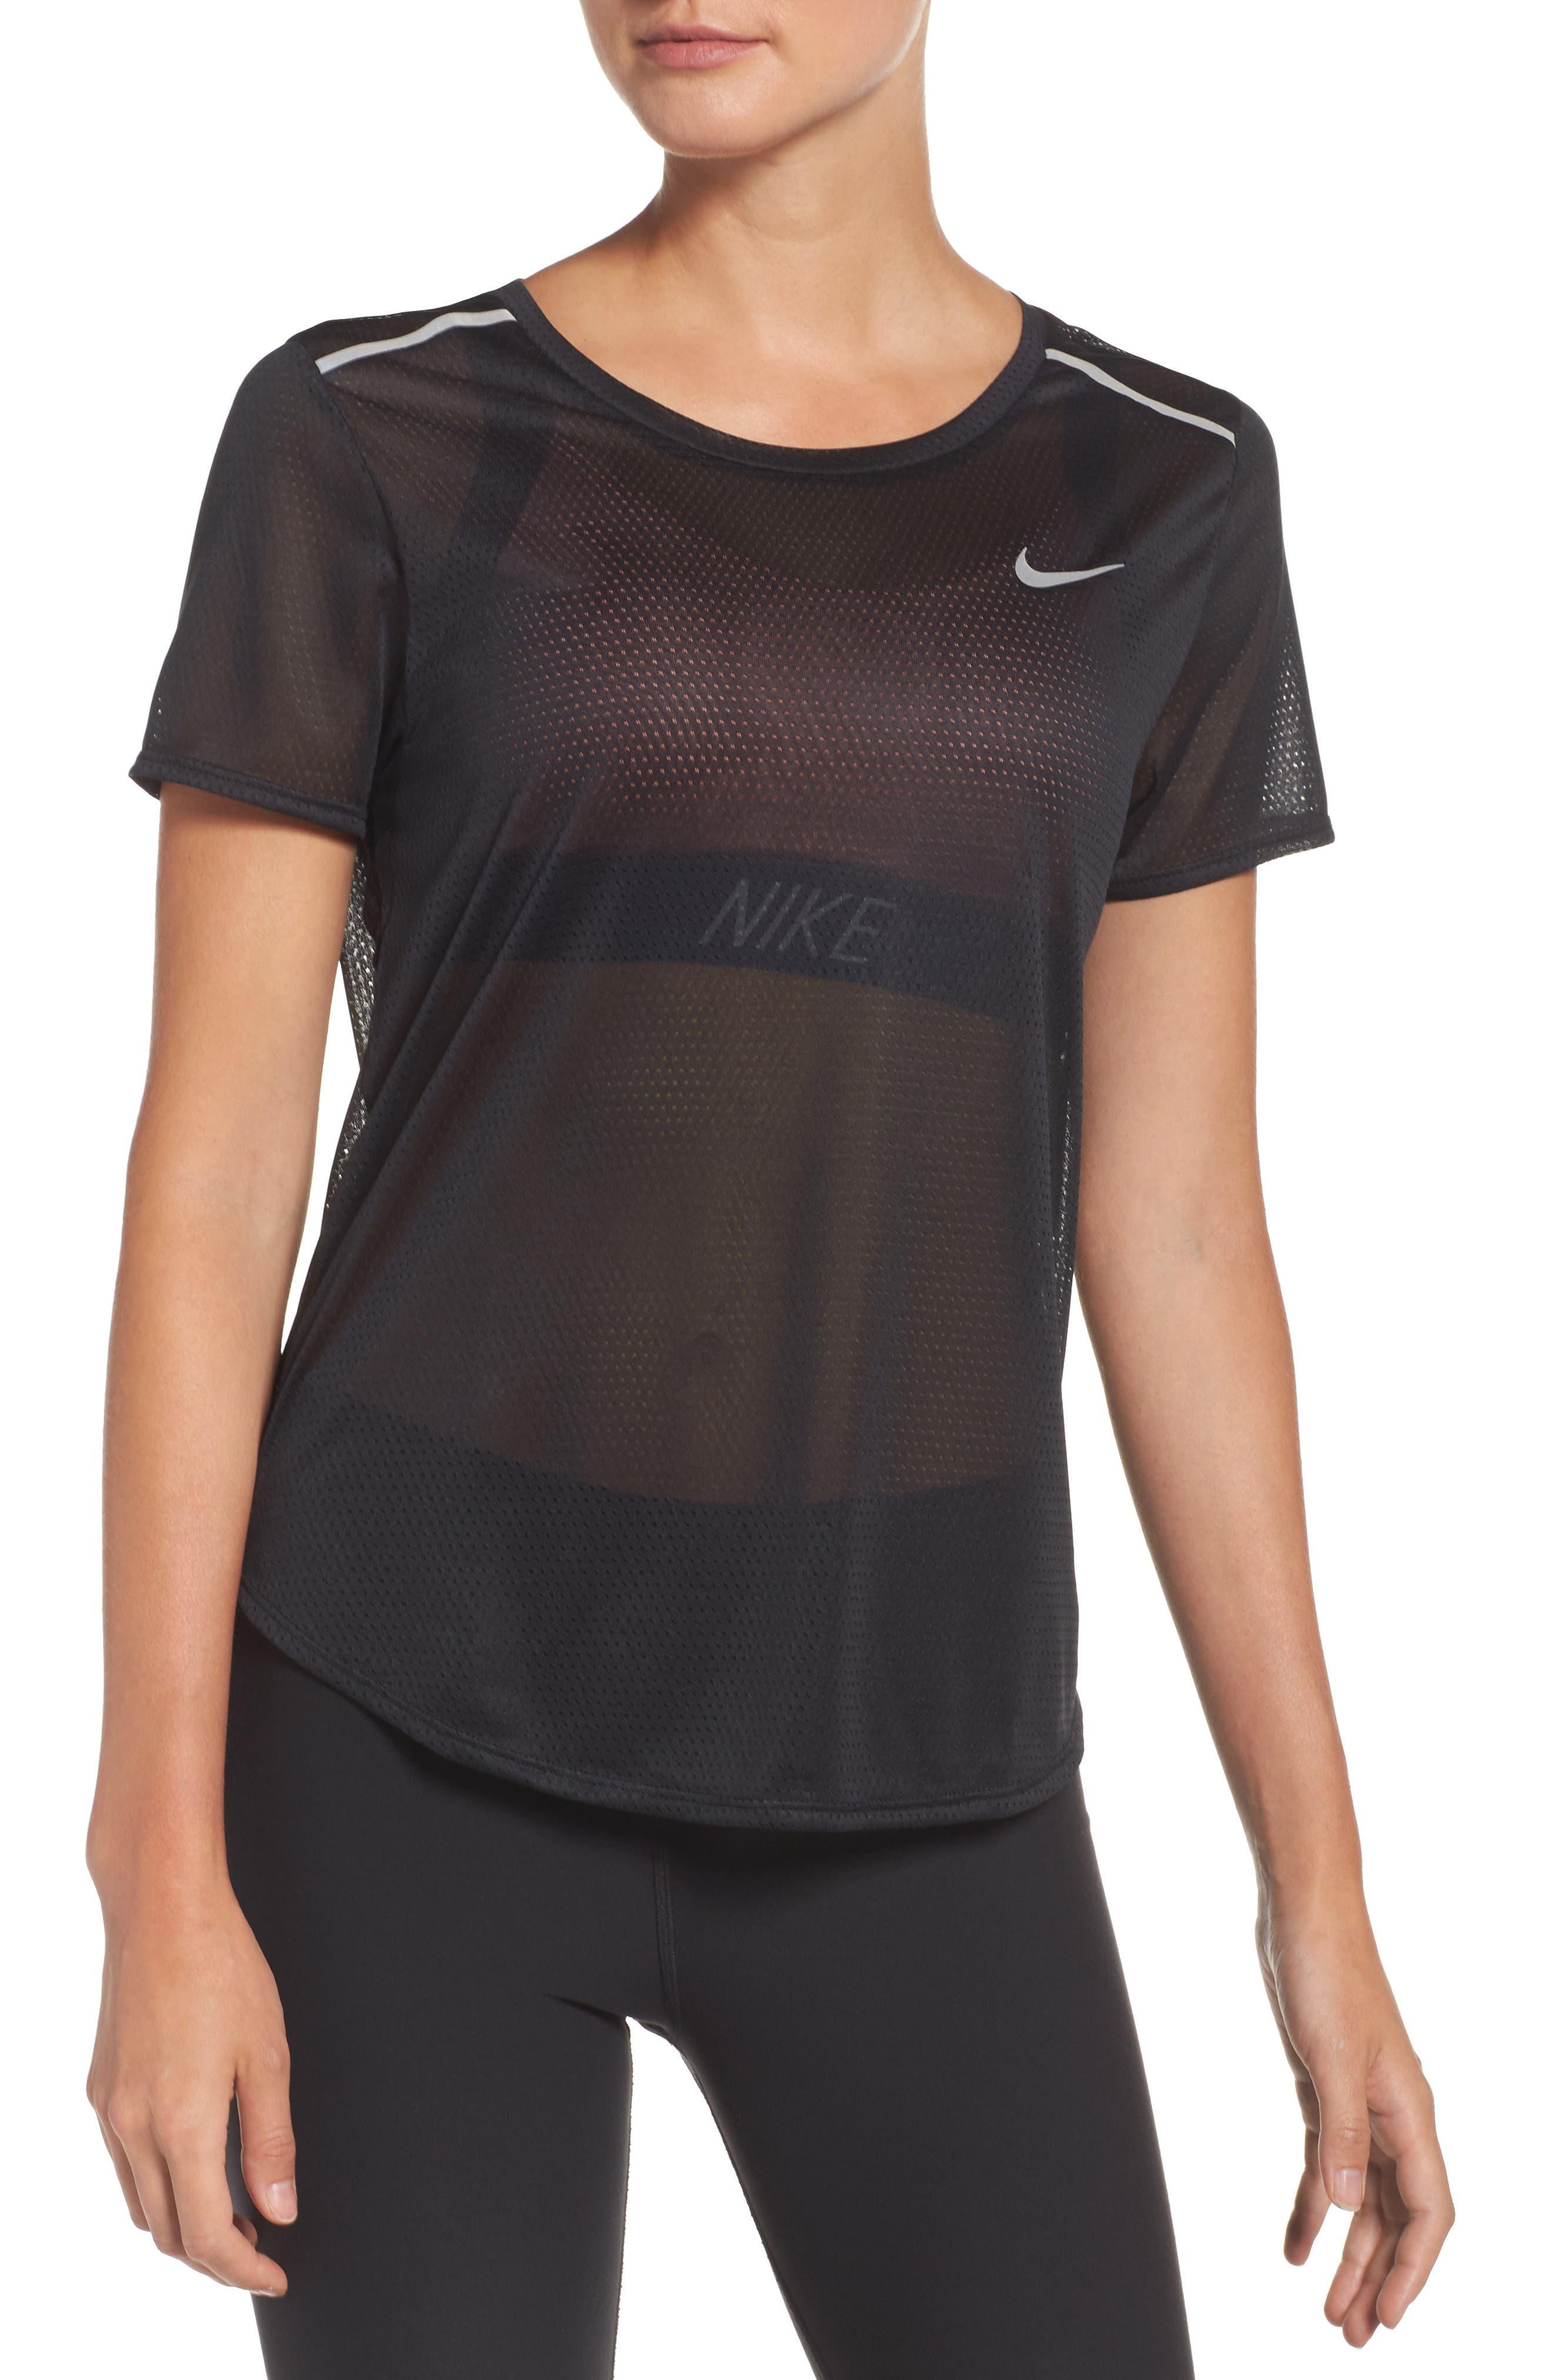 Alternate Image 1 Selected - Nike Breathe Running Tee